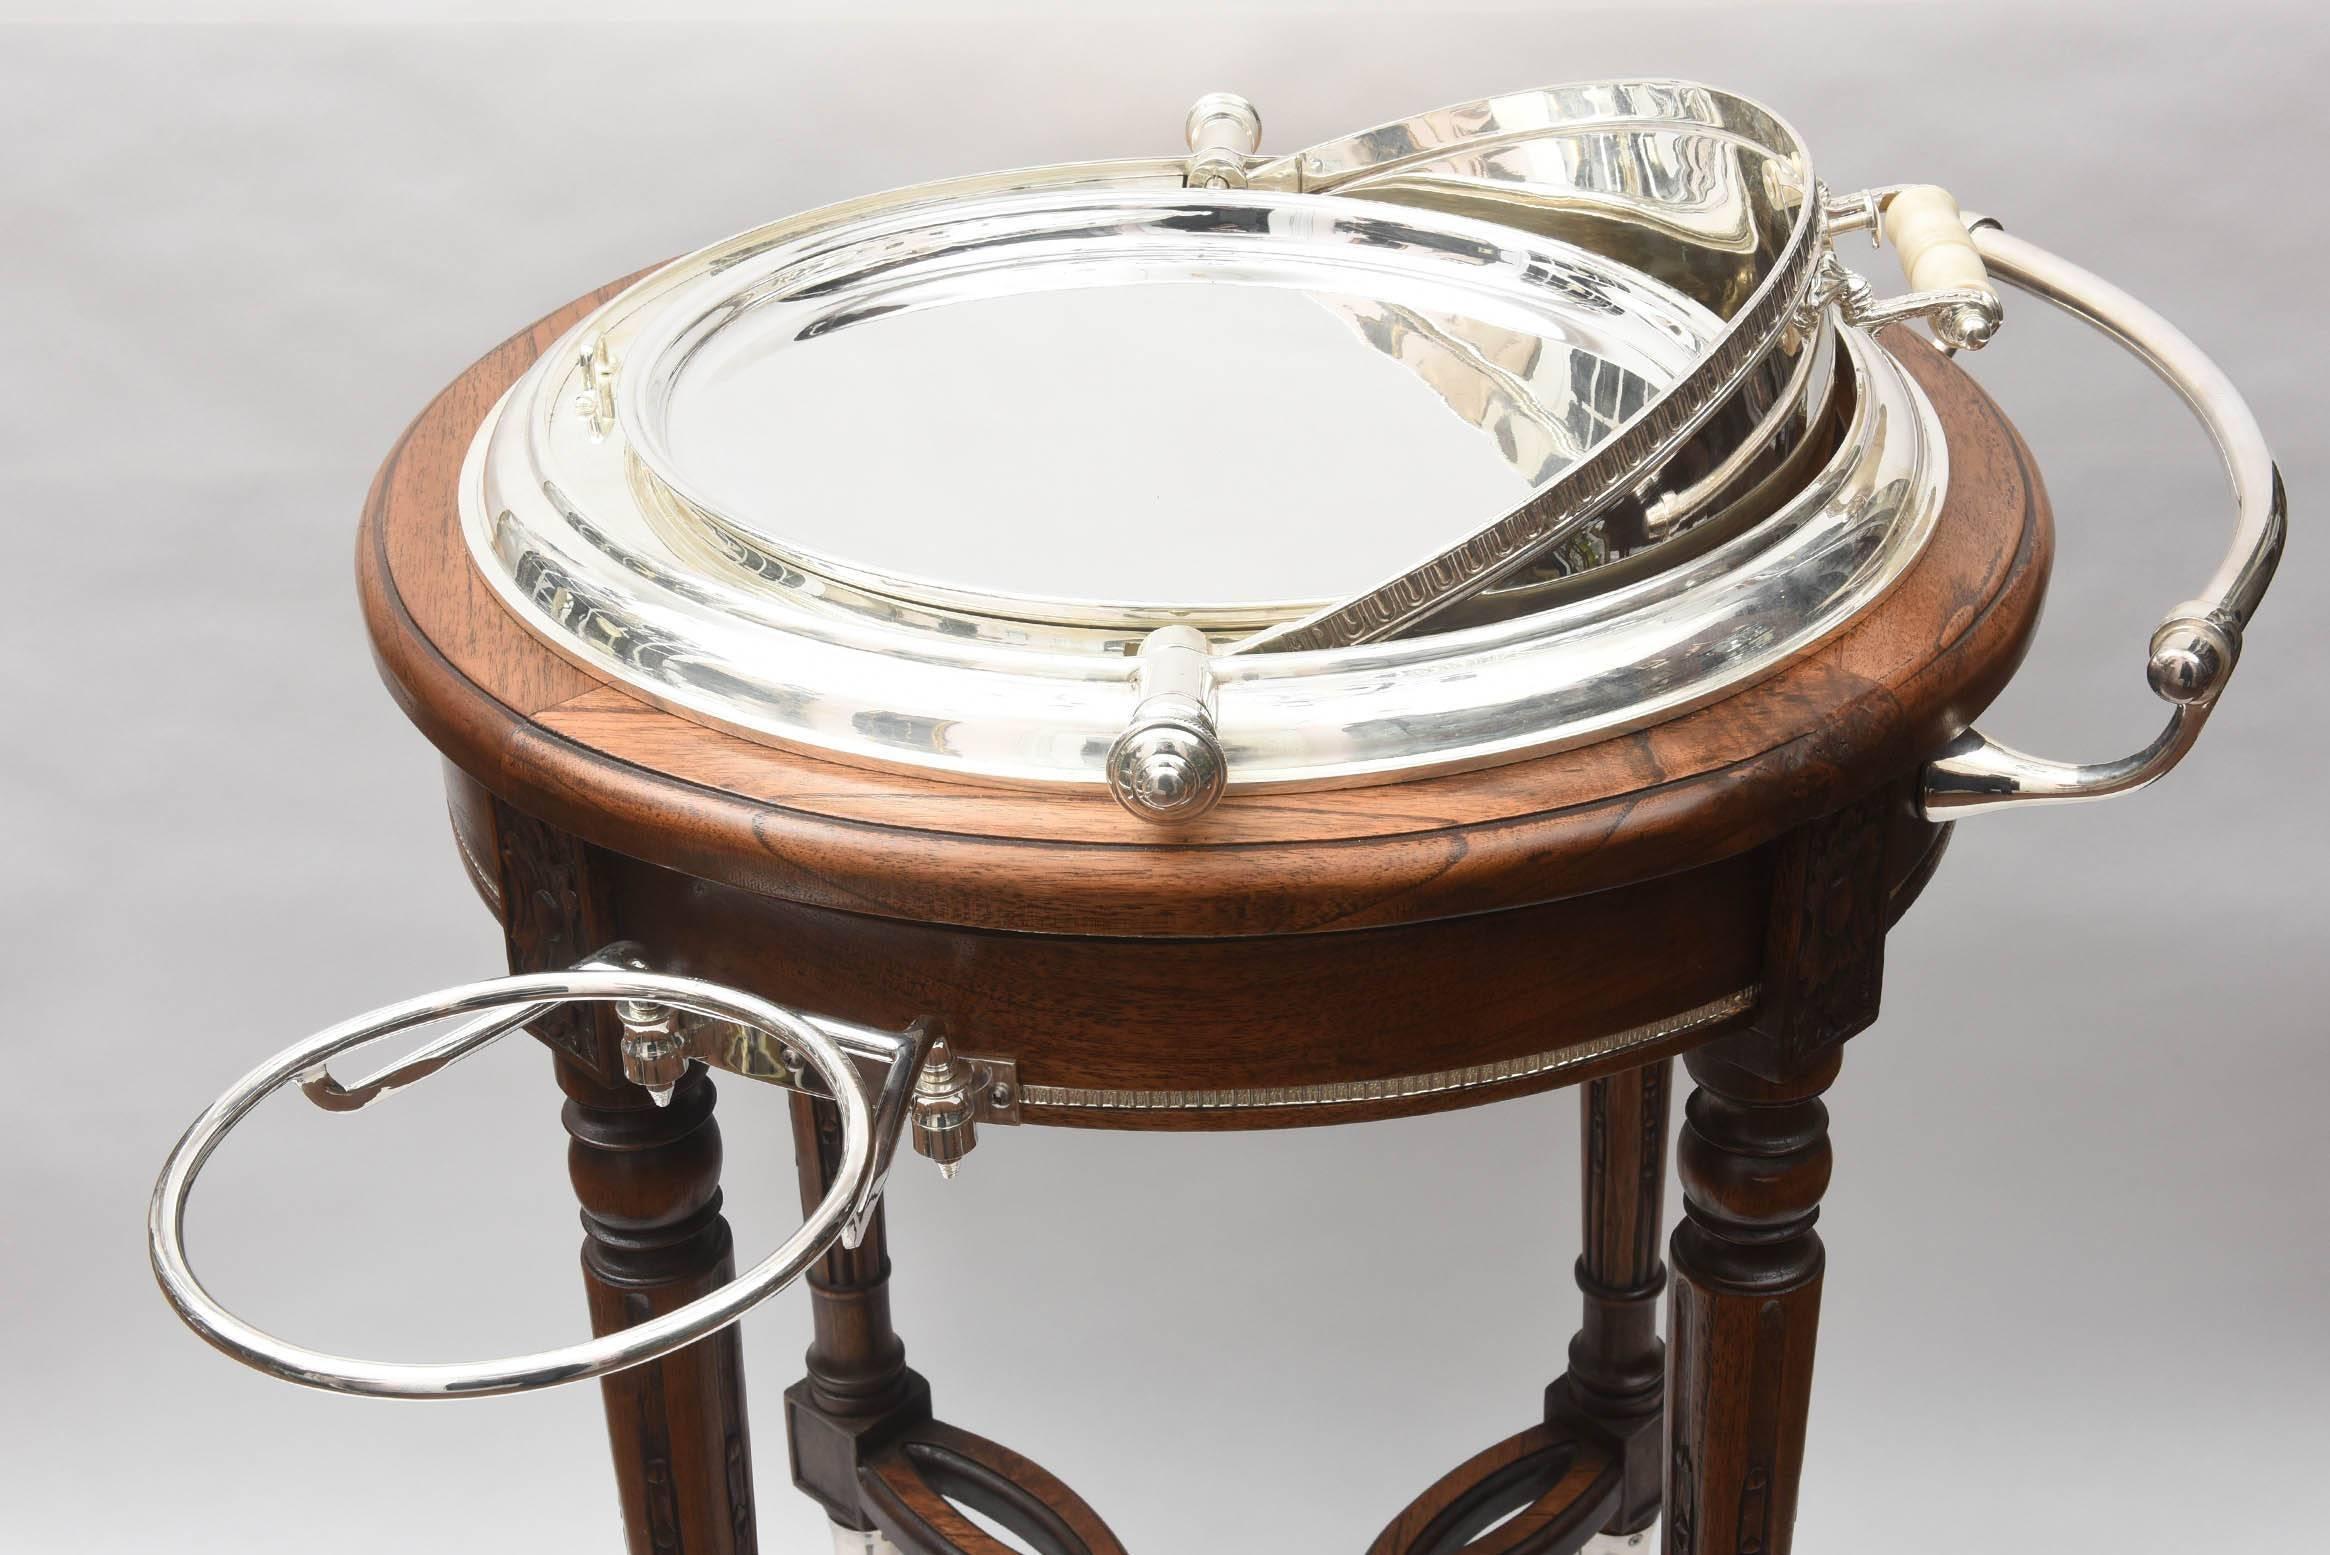 Impressive vintage italian silver plate carving station or